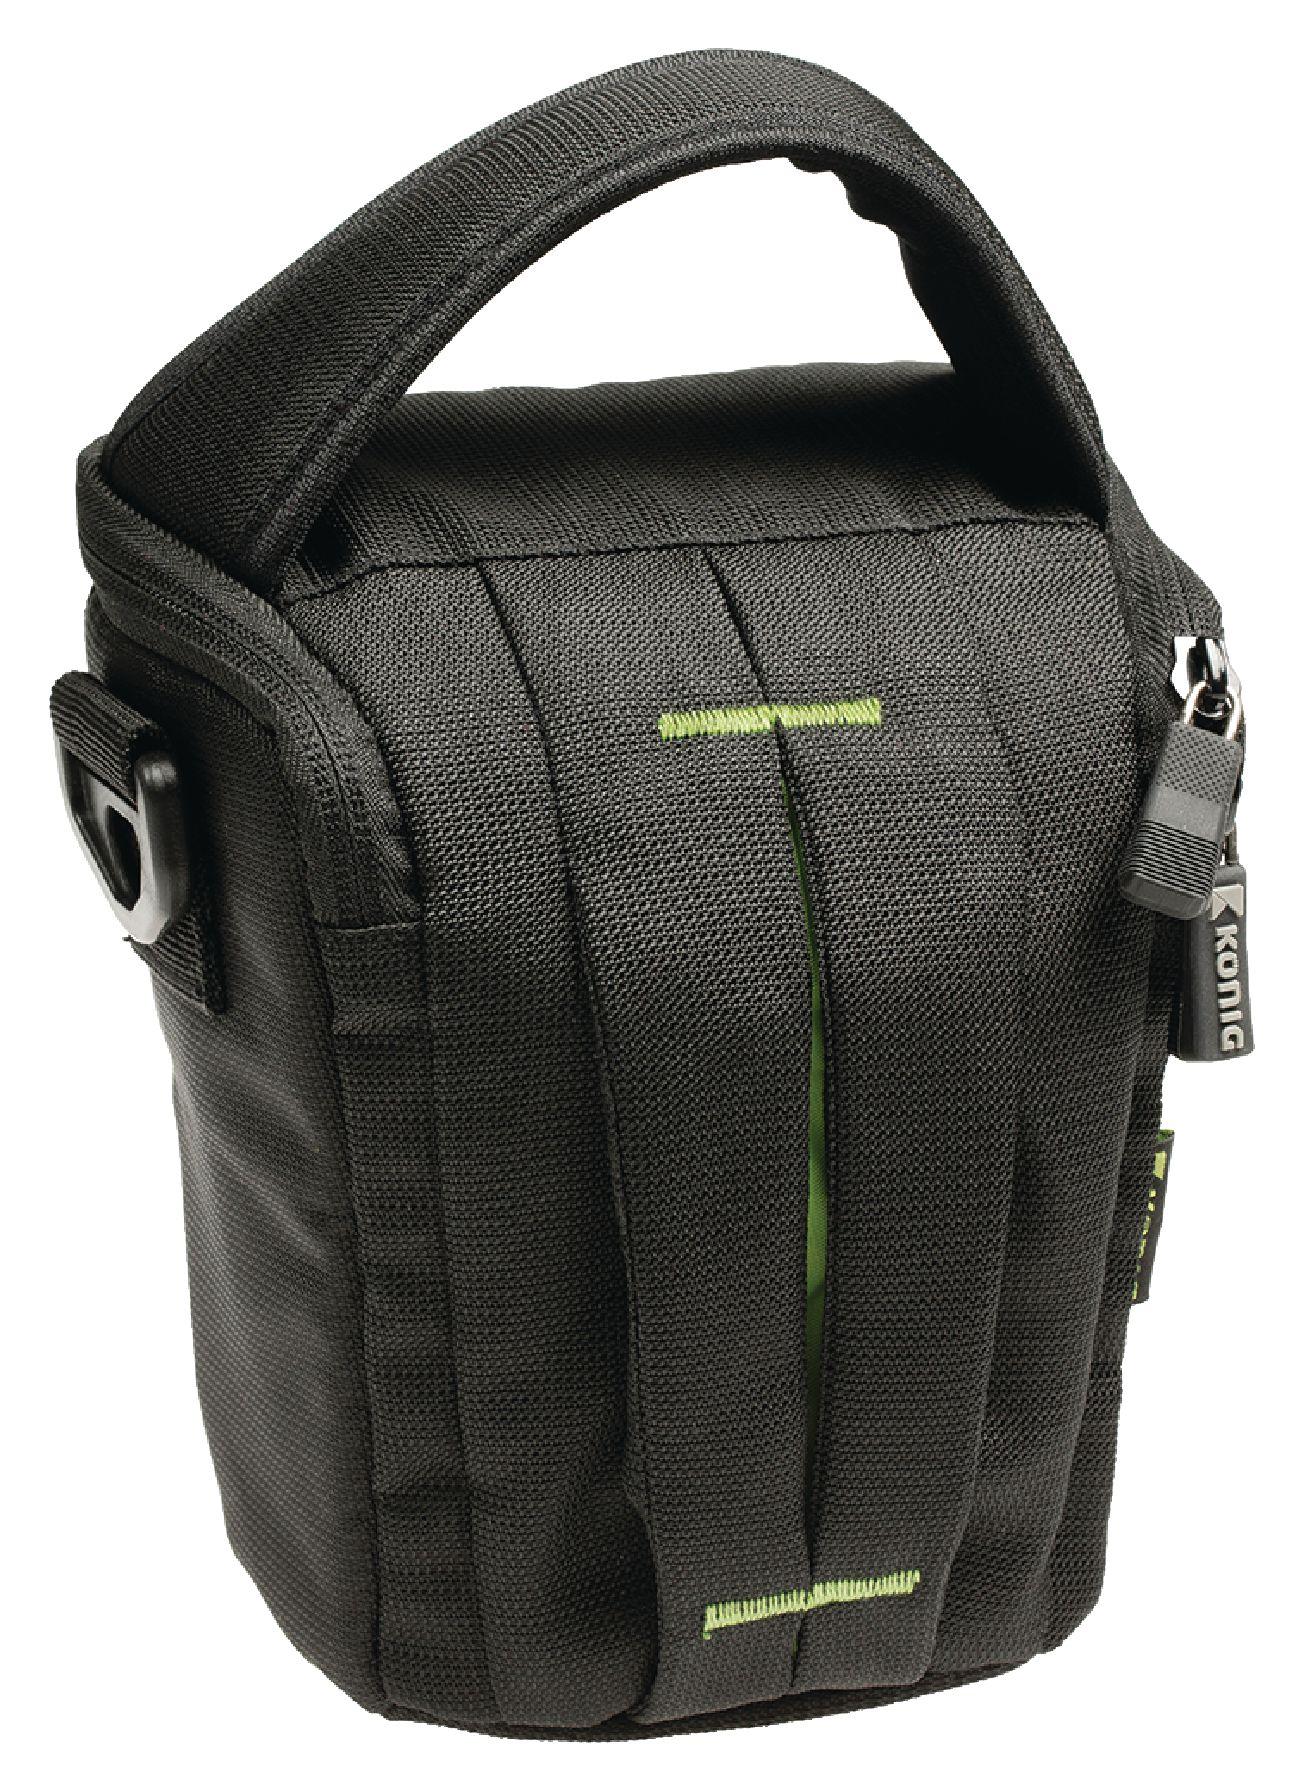 Kamera hylster taske 140x150x110, sort/grøn